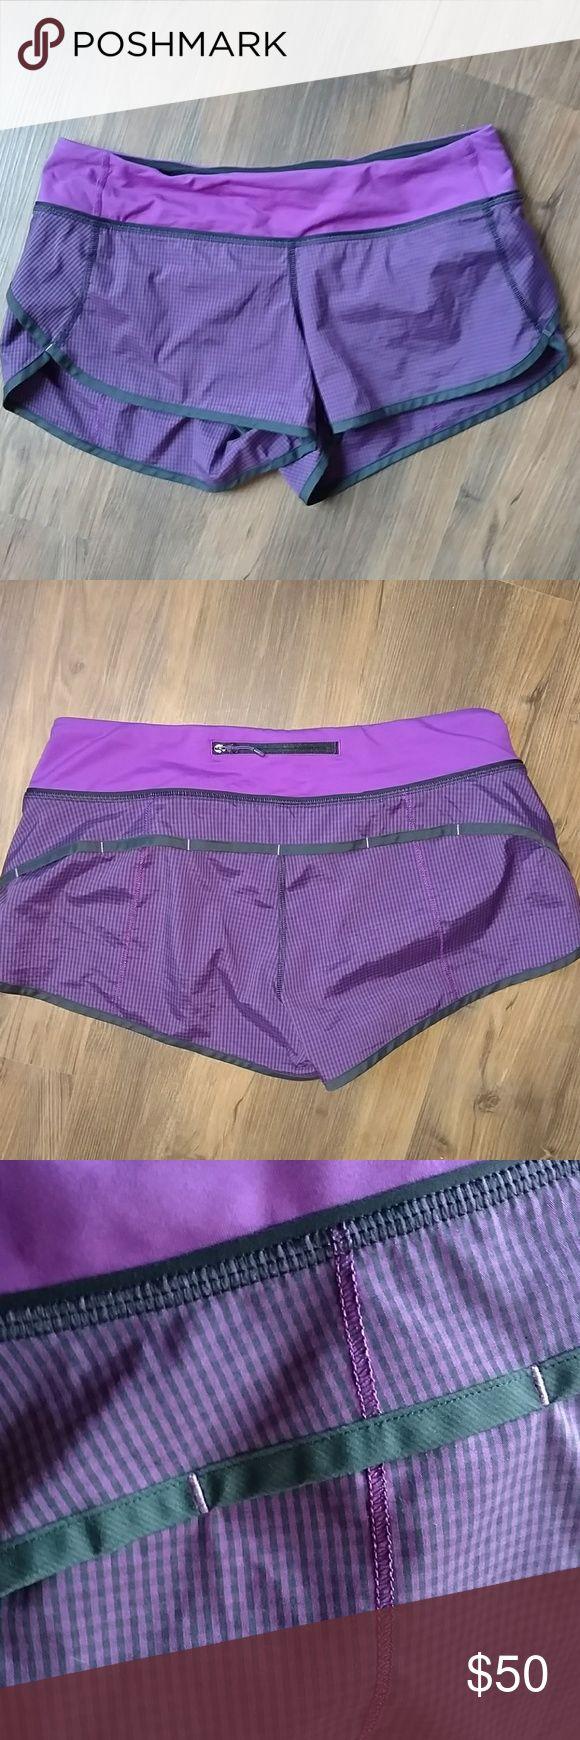 Lululemon 2way speed shorts VGUC 2-way purple & black mini check speed shorts. No snags or pilling. lululemon athletica Shorts